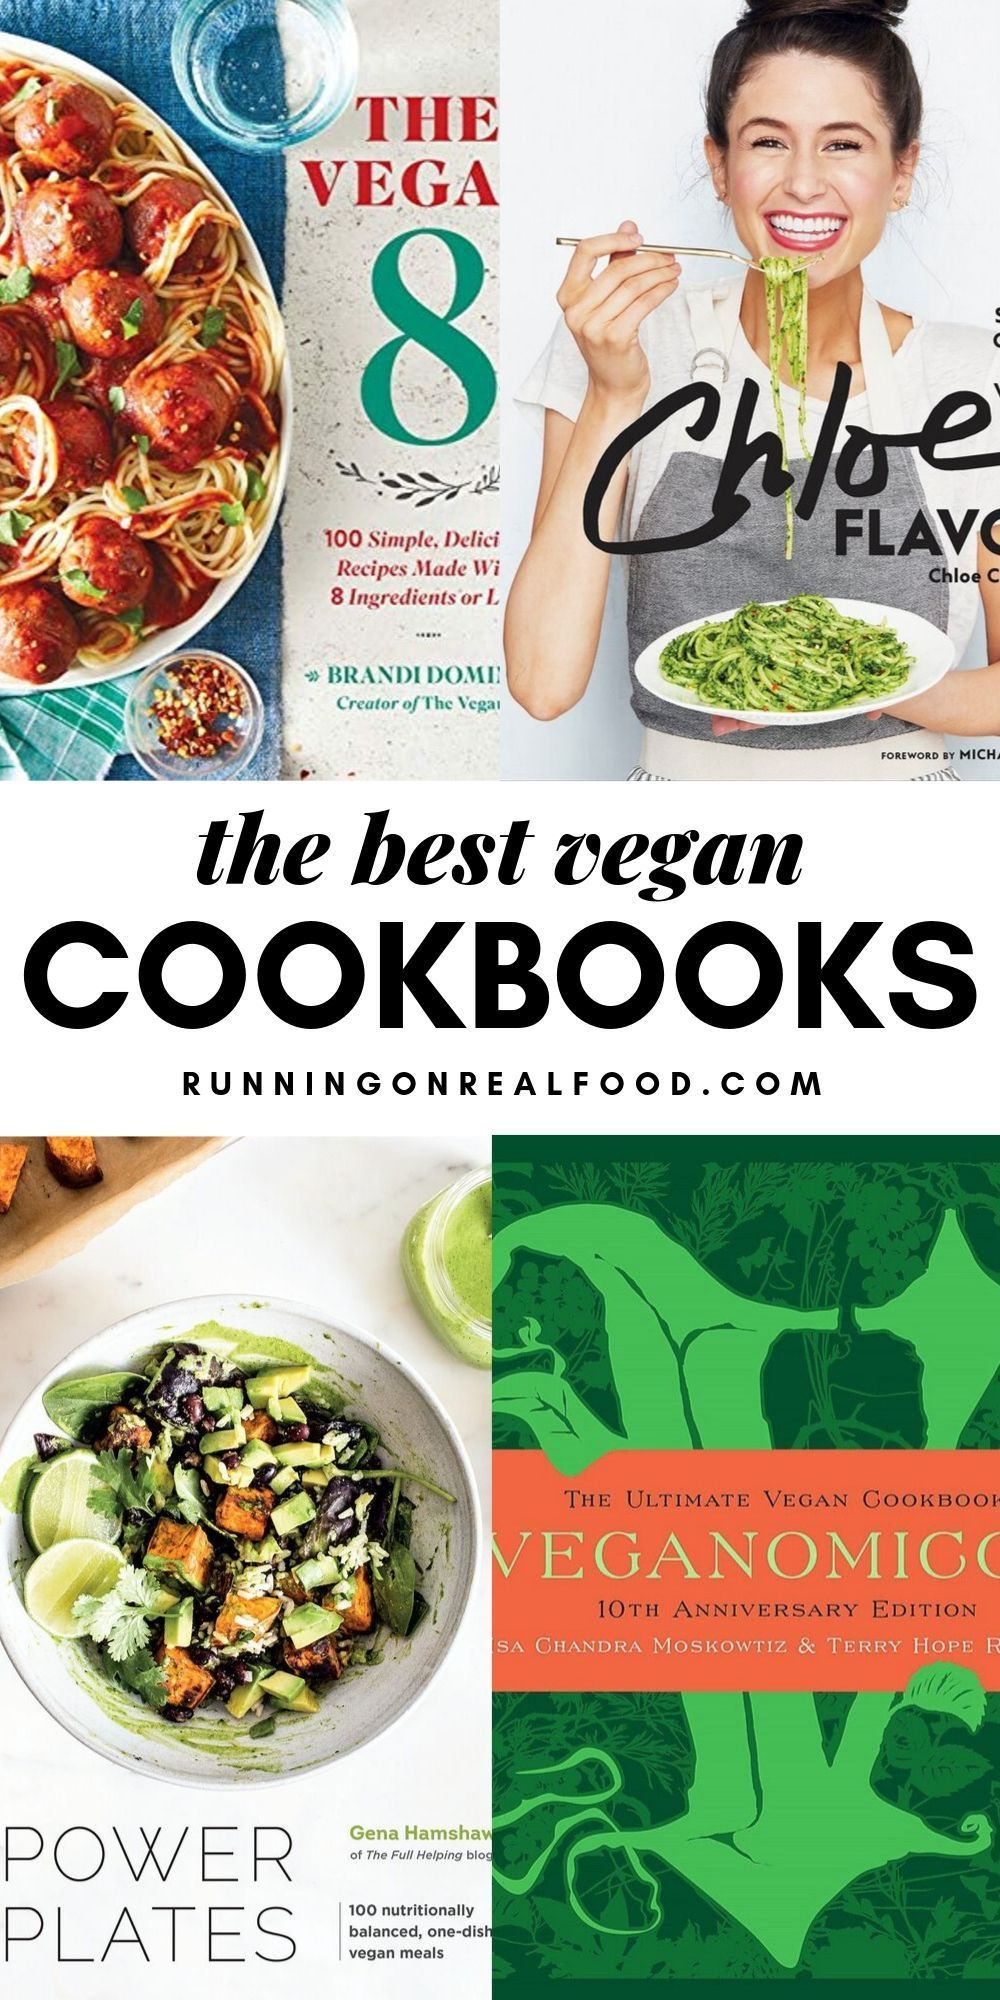 Best Vegan Coobooks Vegan Cookbook Vegetarian Recipes Whole Food Recipes